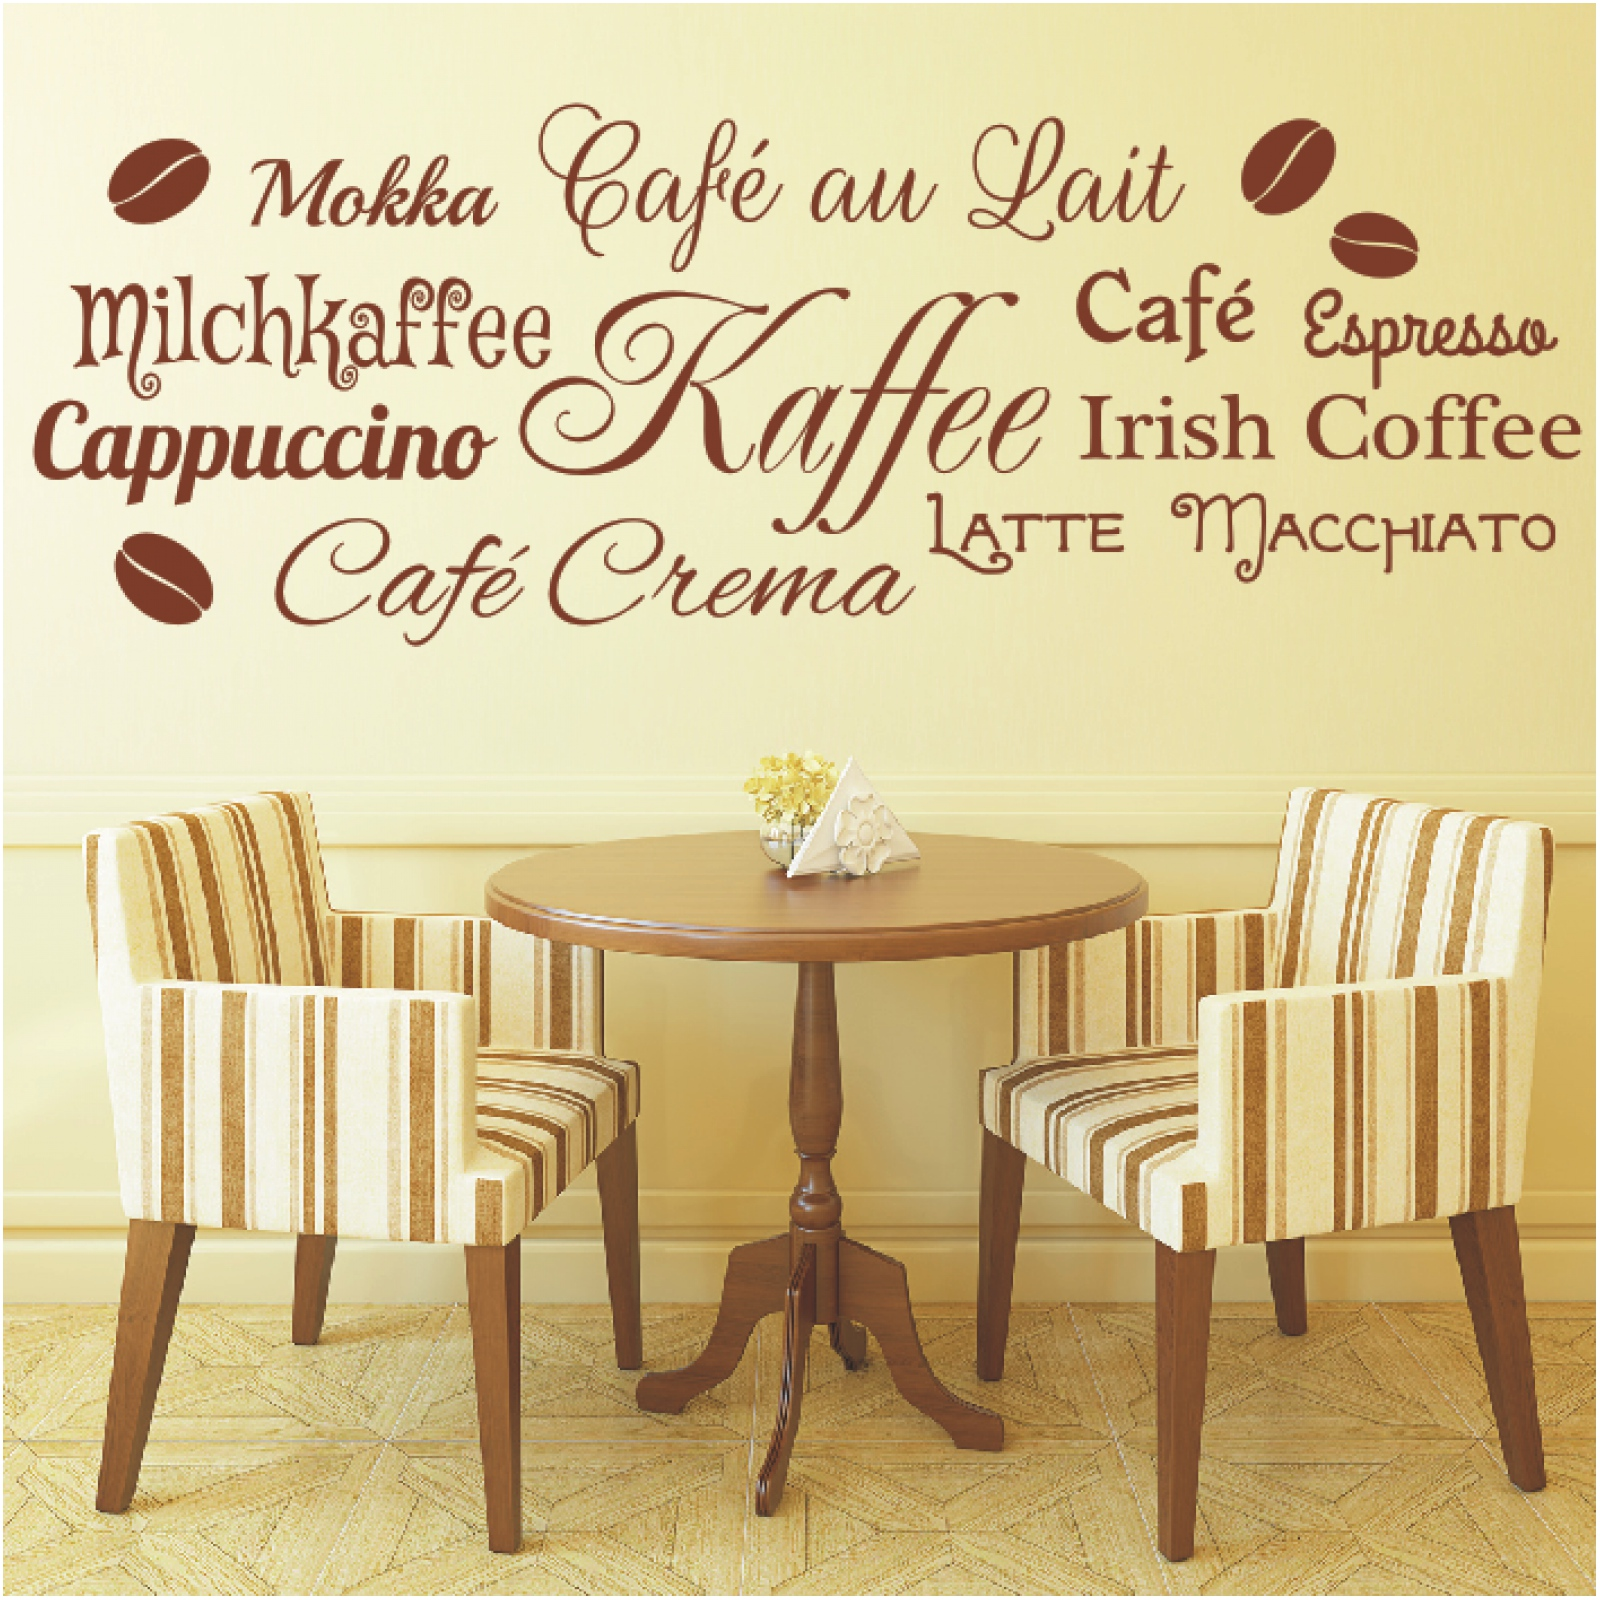 Kaffee U2013 Latte Macchiato, Milchkaffee, Cappuccino, Espresso, Café Au  Lait, Café